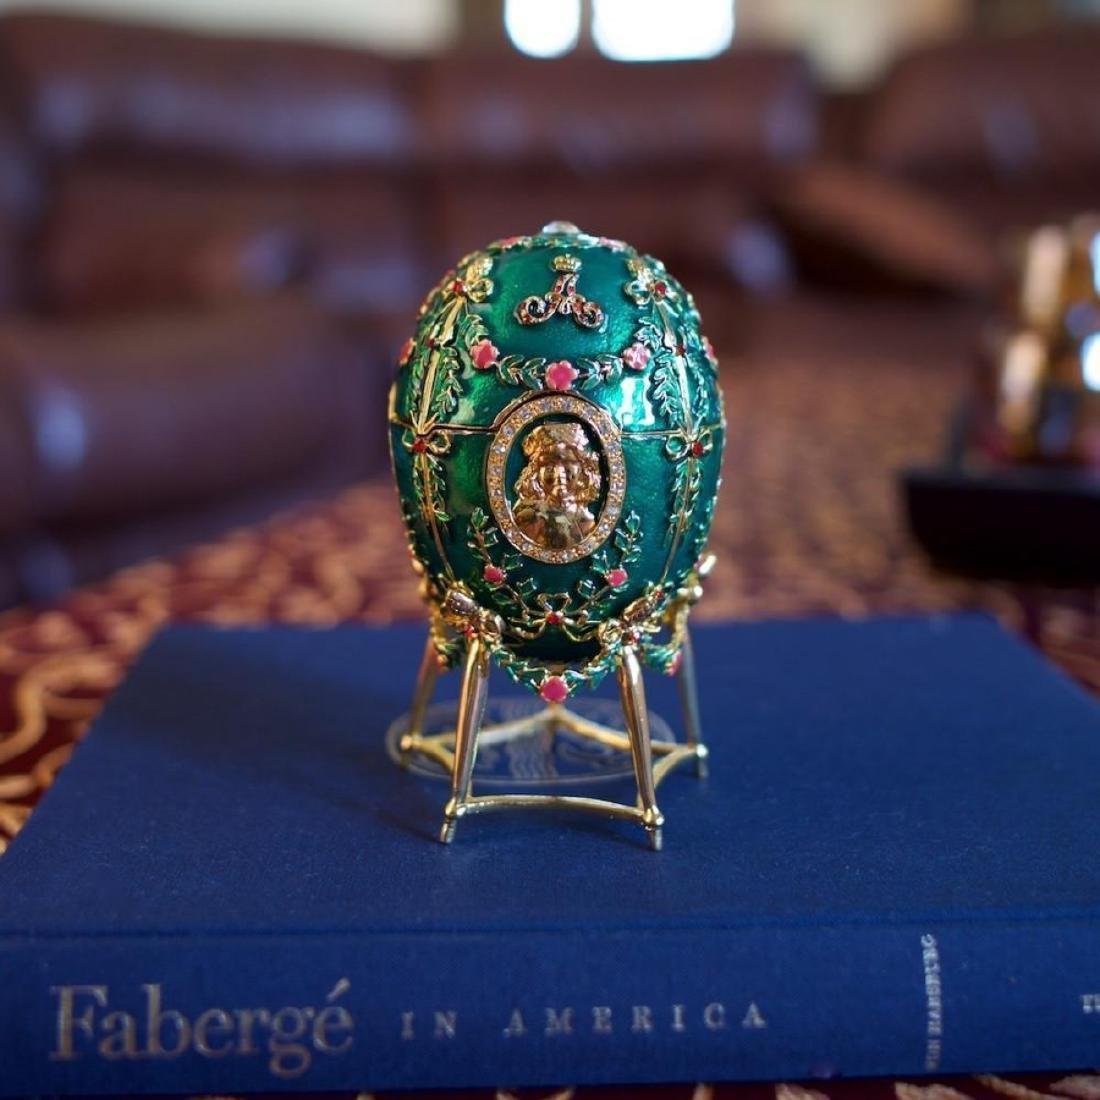 Faberge Inspired 1908 Alexander Palace Faberge Egg - 2